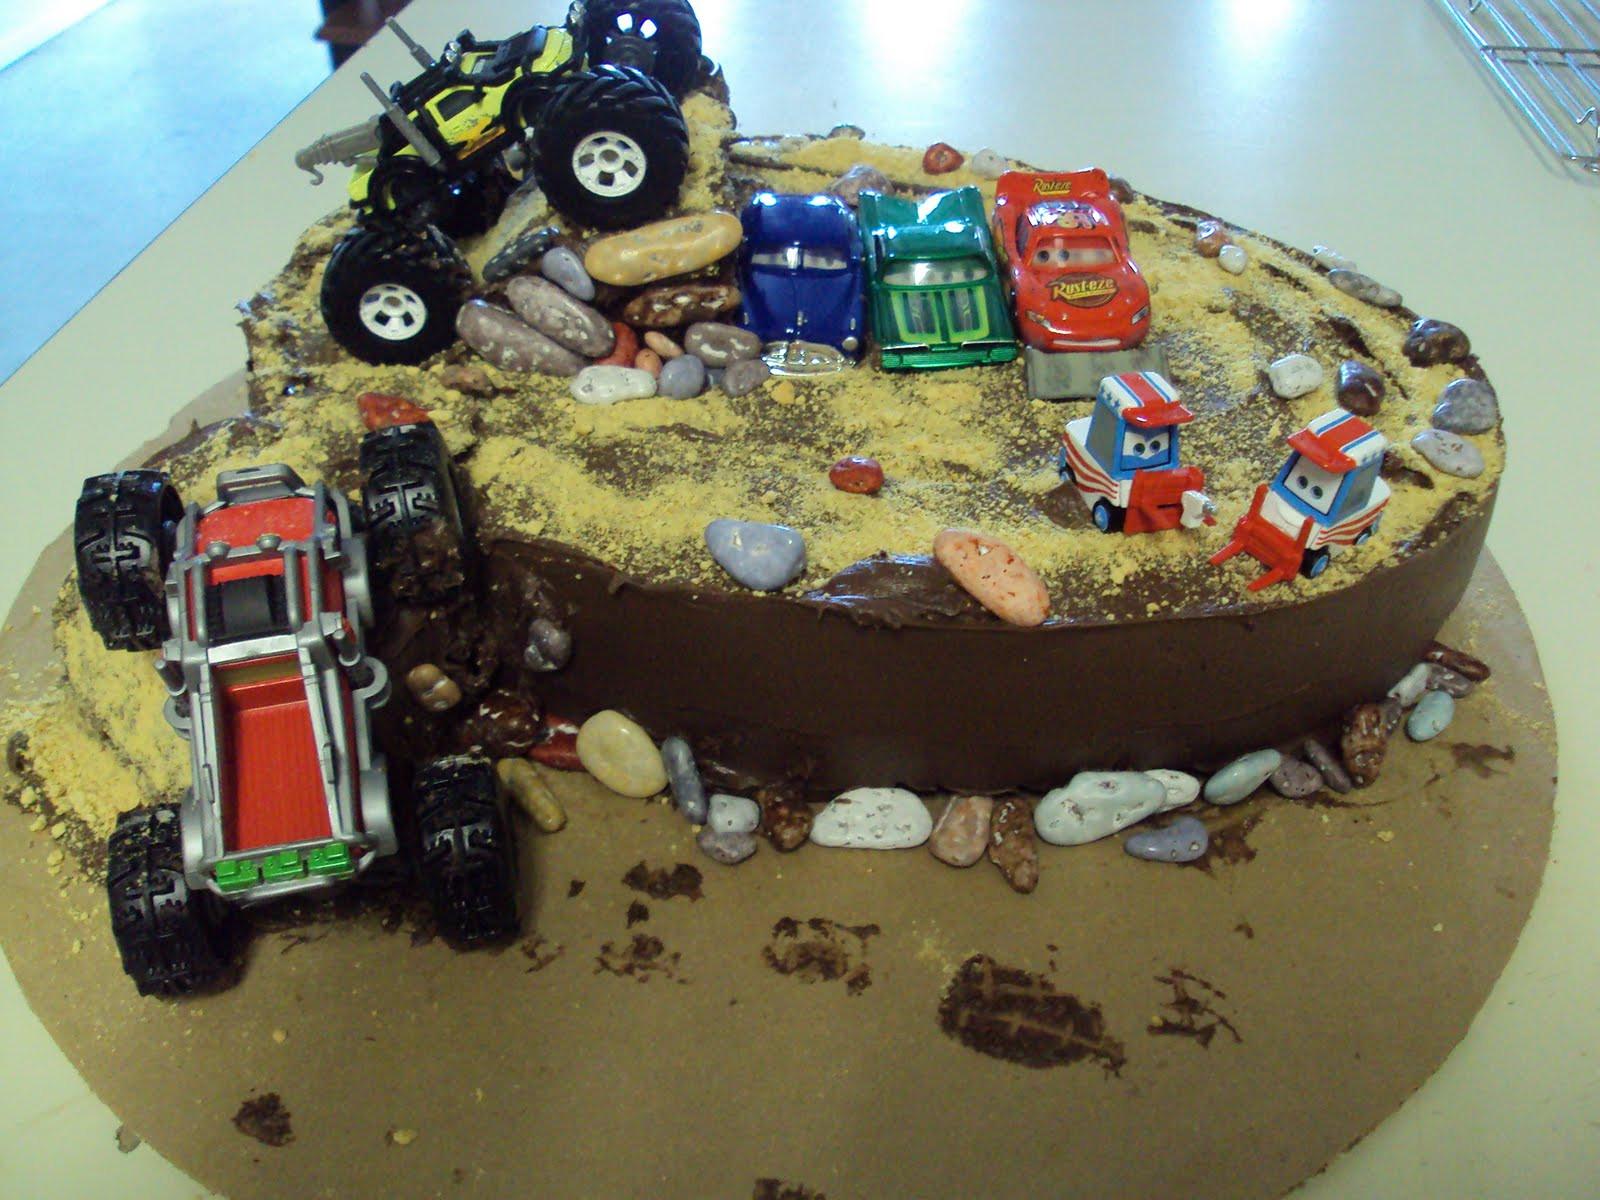 Halloween Cakes At Walmart  ARMY BRATS BIRTHDAY CAKES